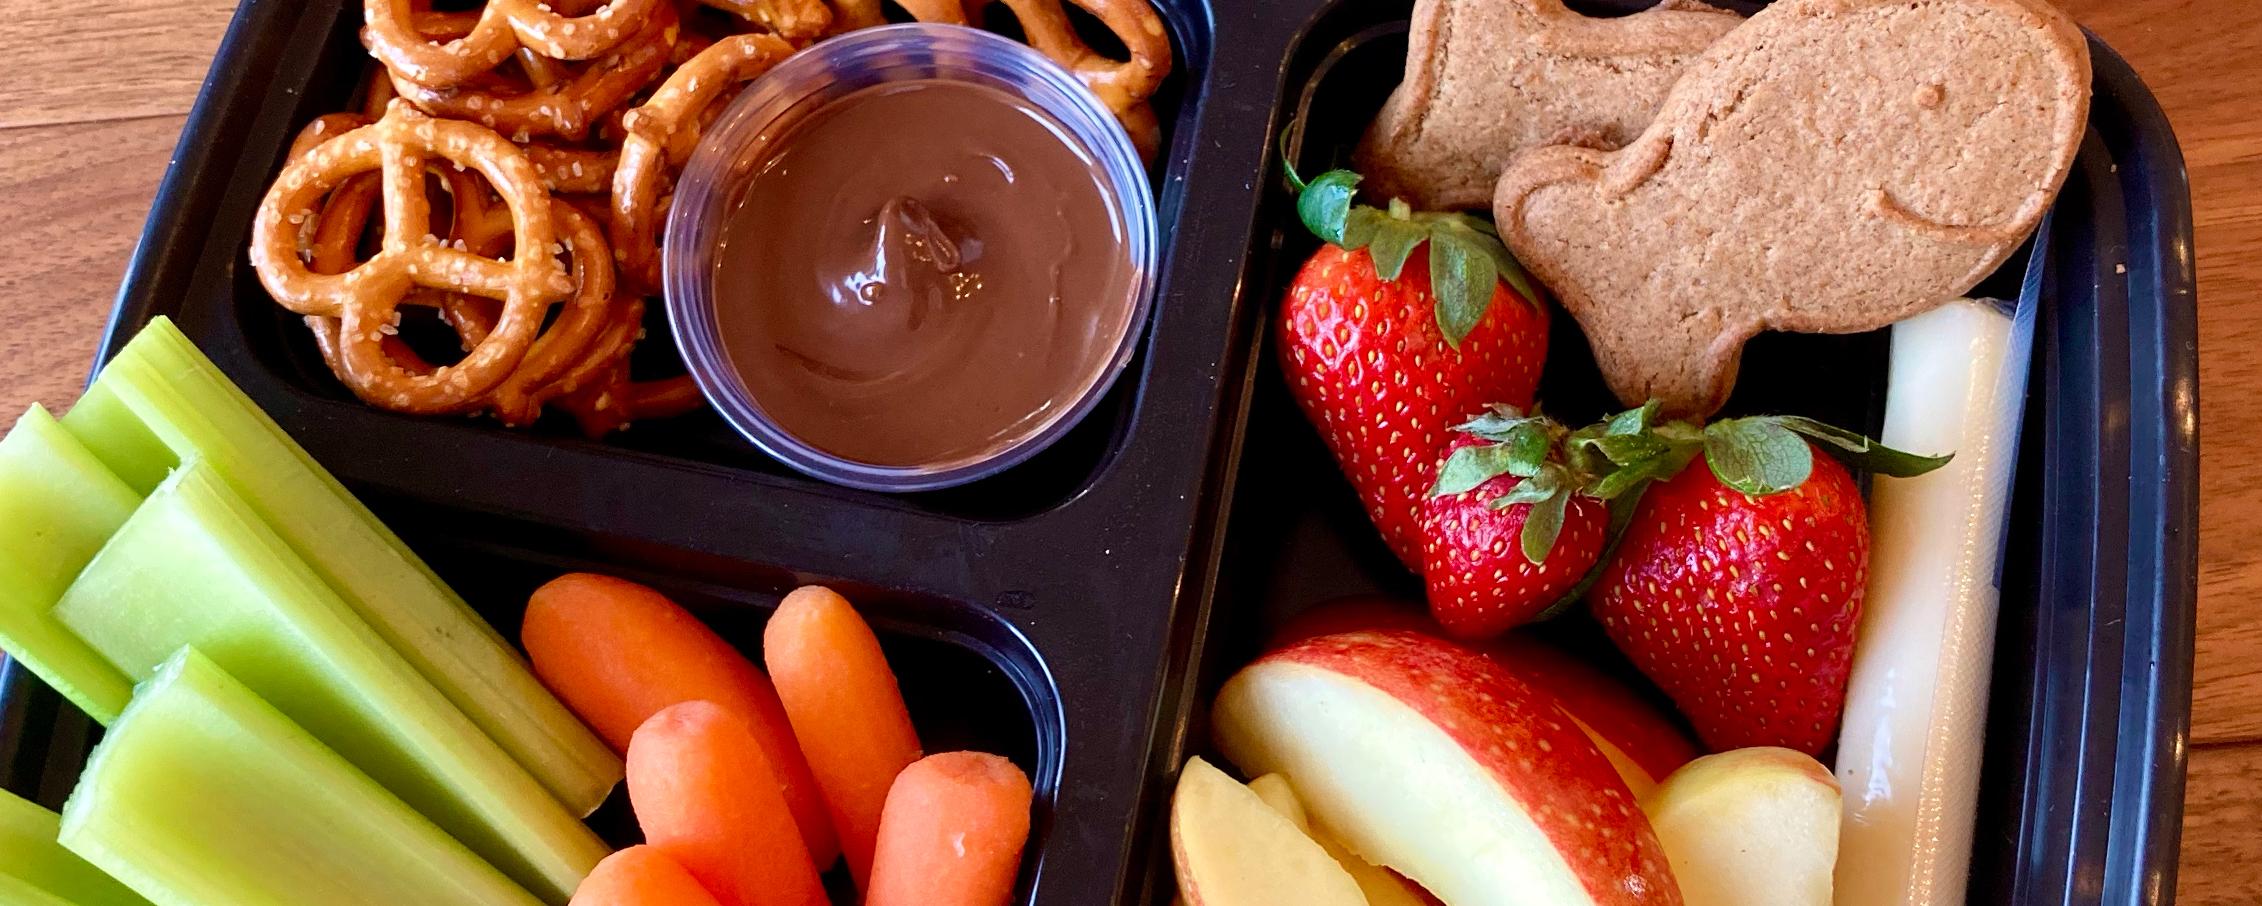 slider-chocolate